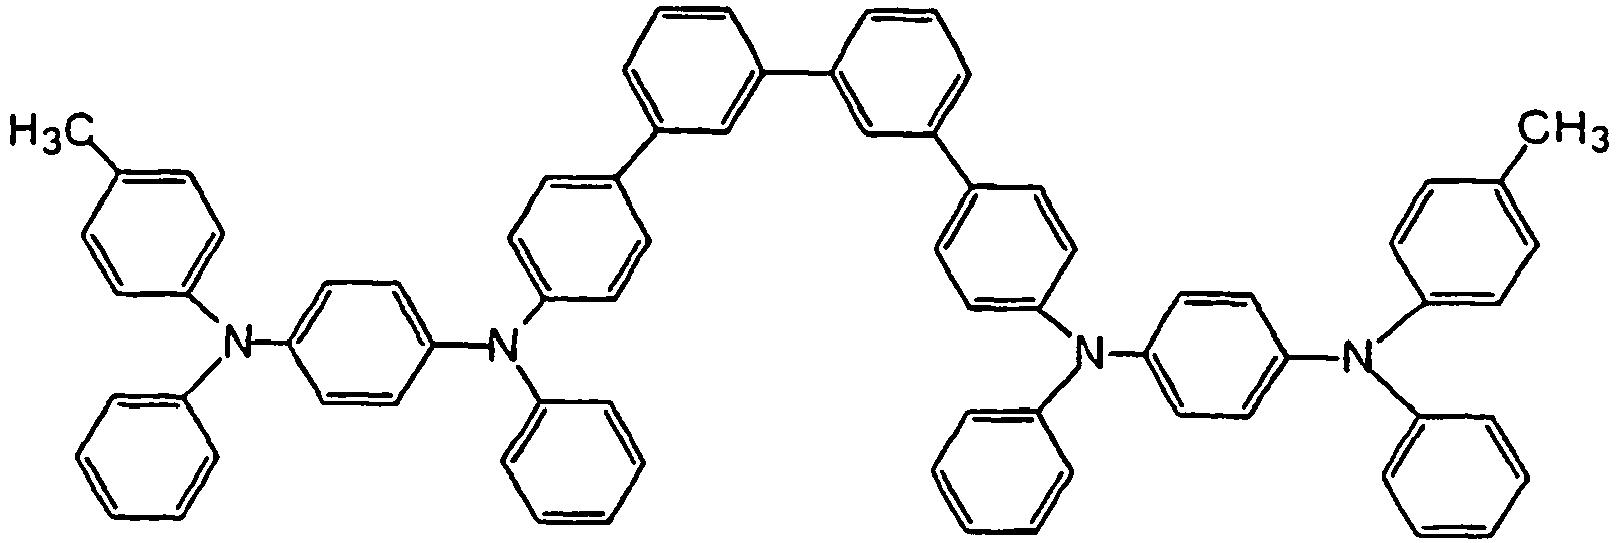 Figure imgb0930